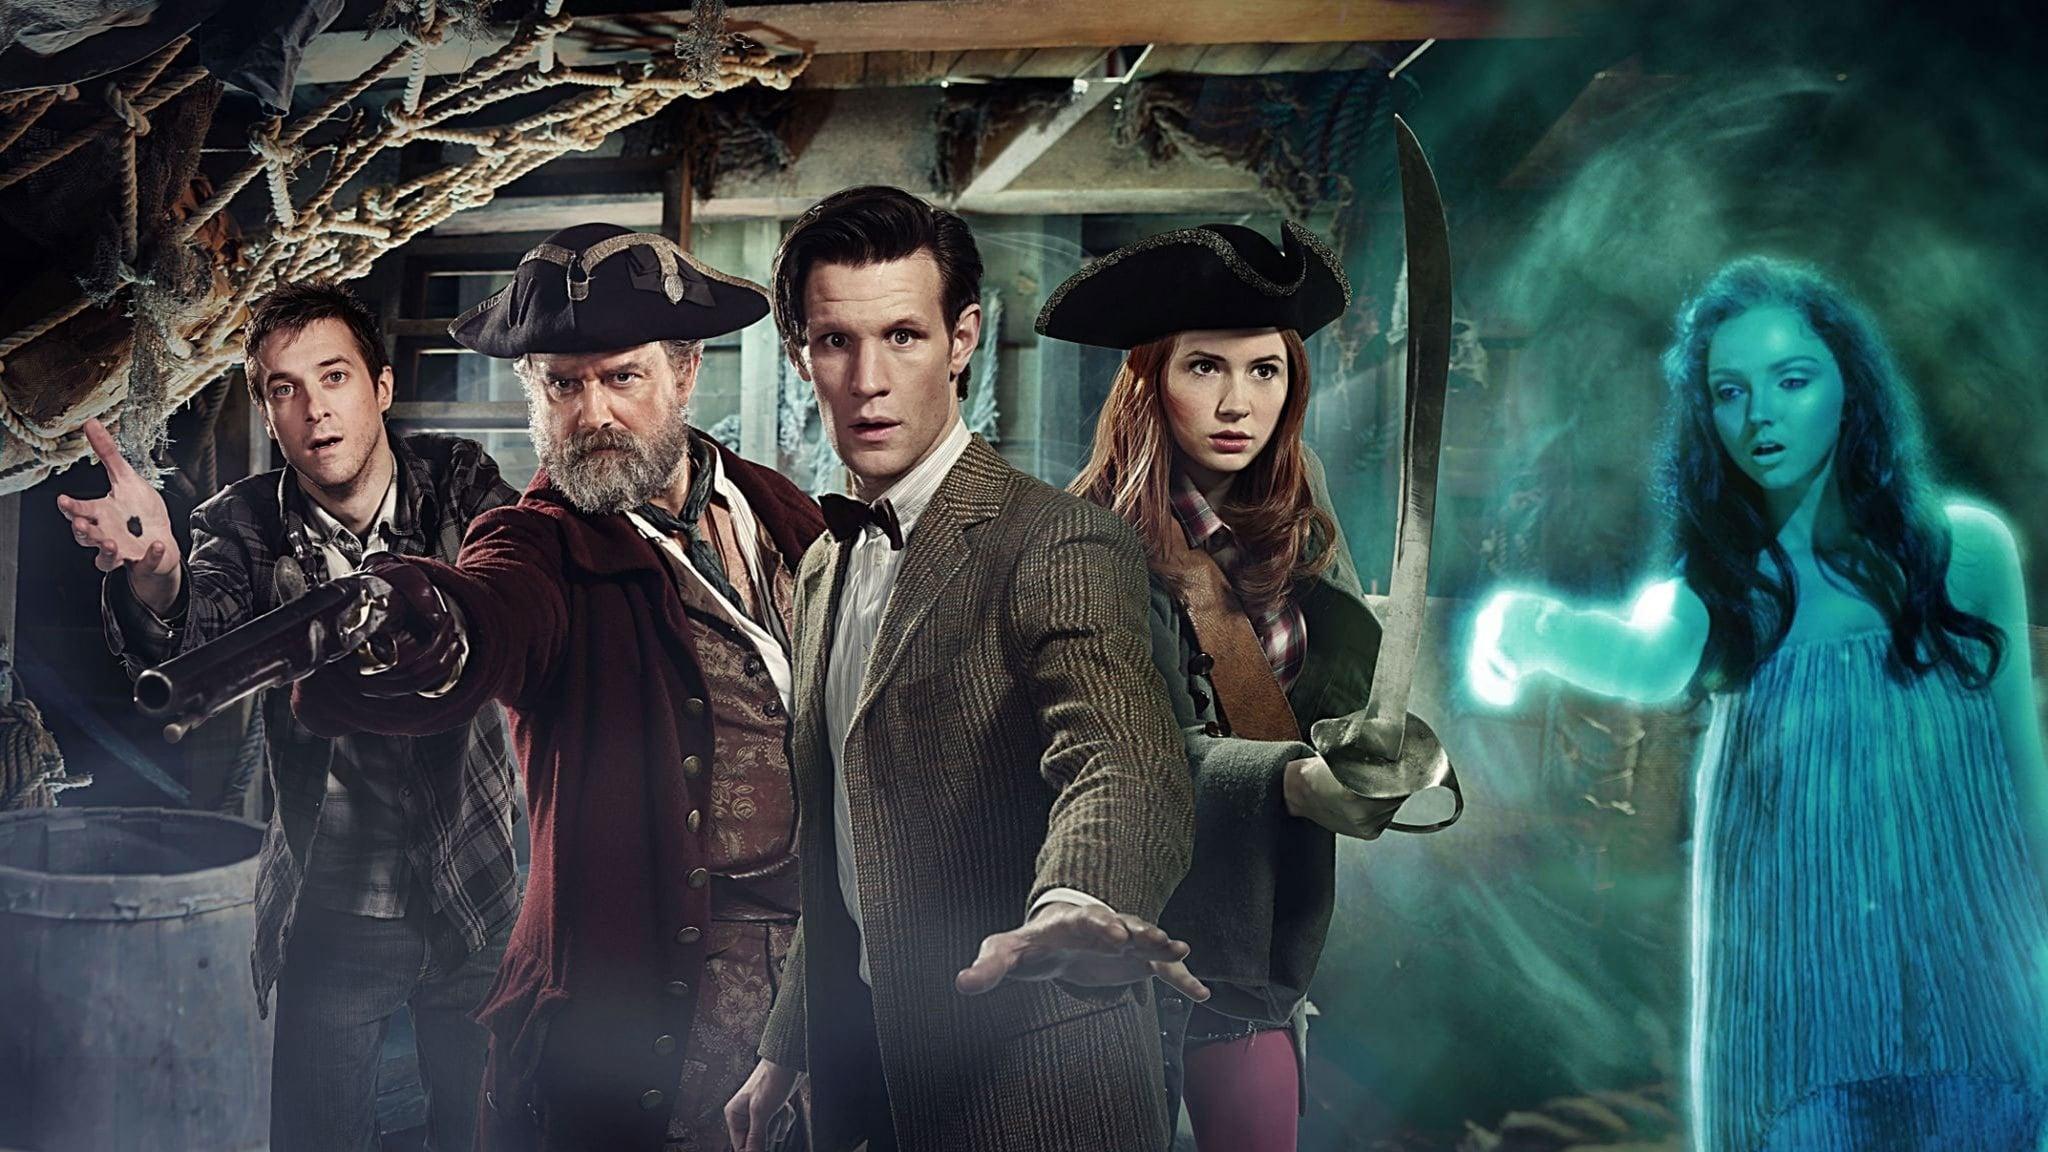 Doctor Who Season 6 :Episode 3  The Curse of the Black Spot